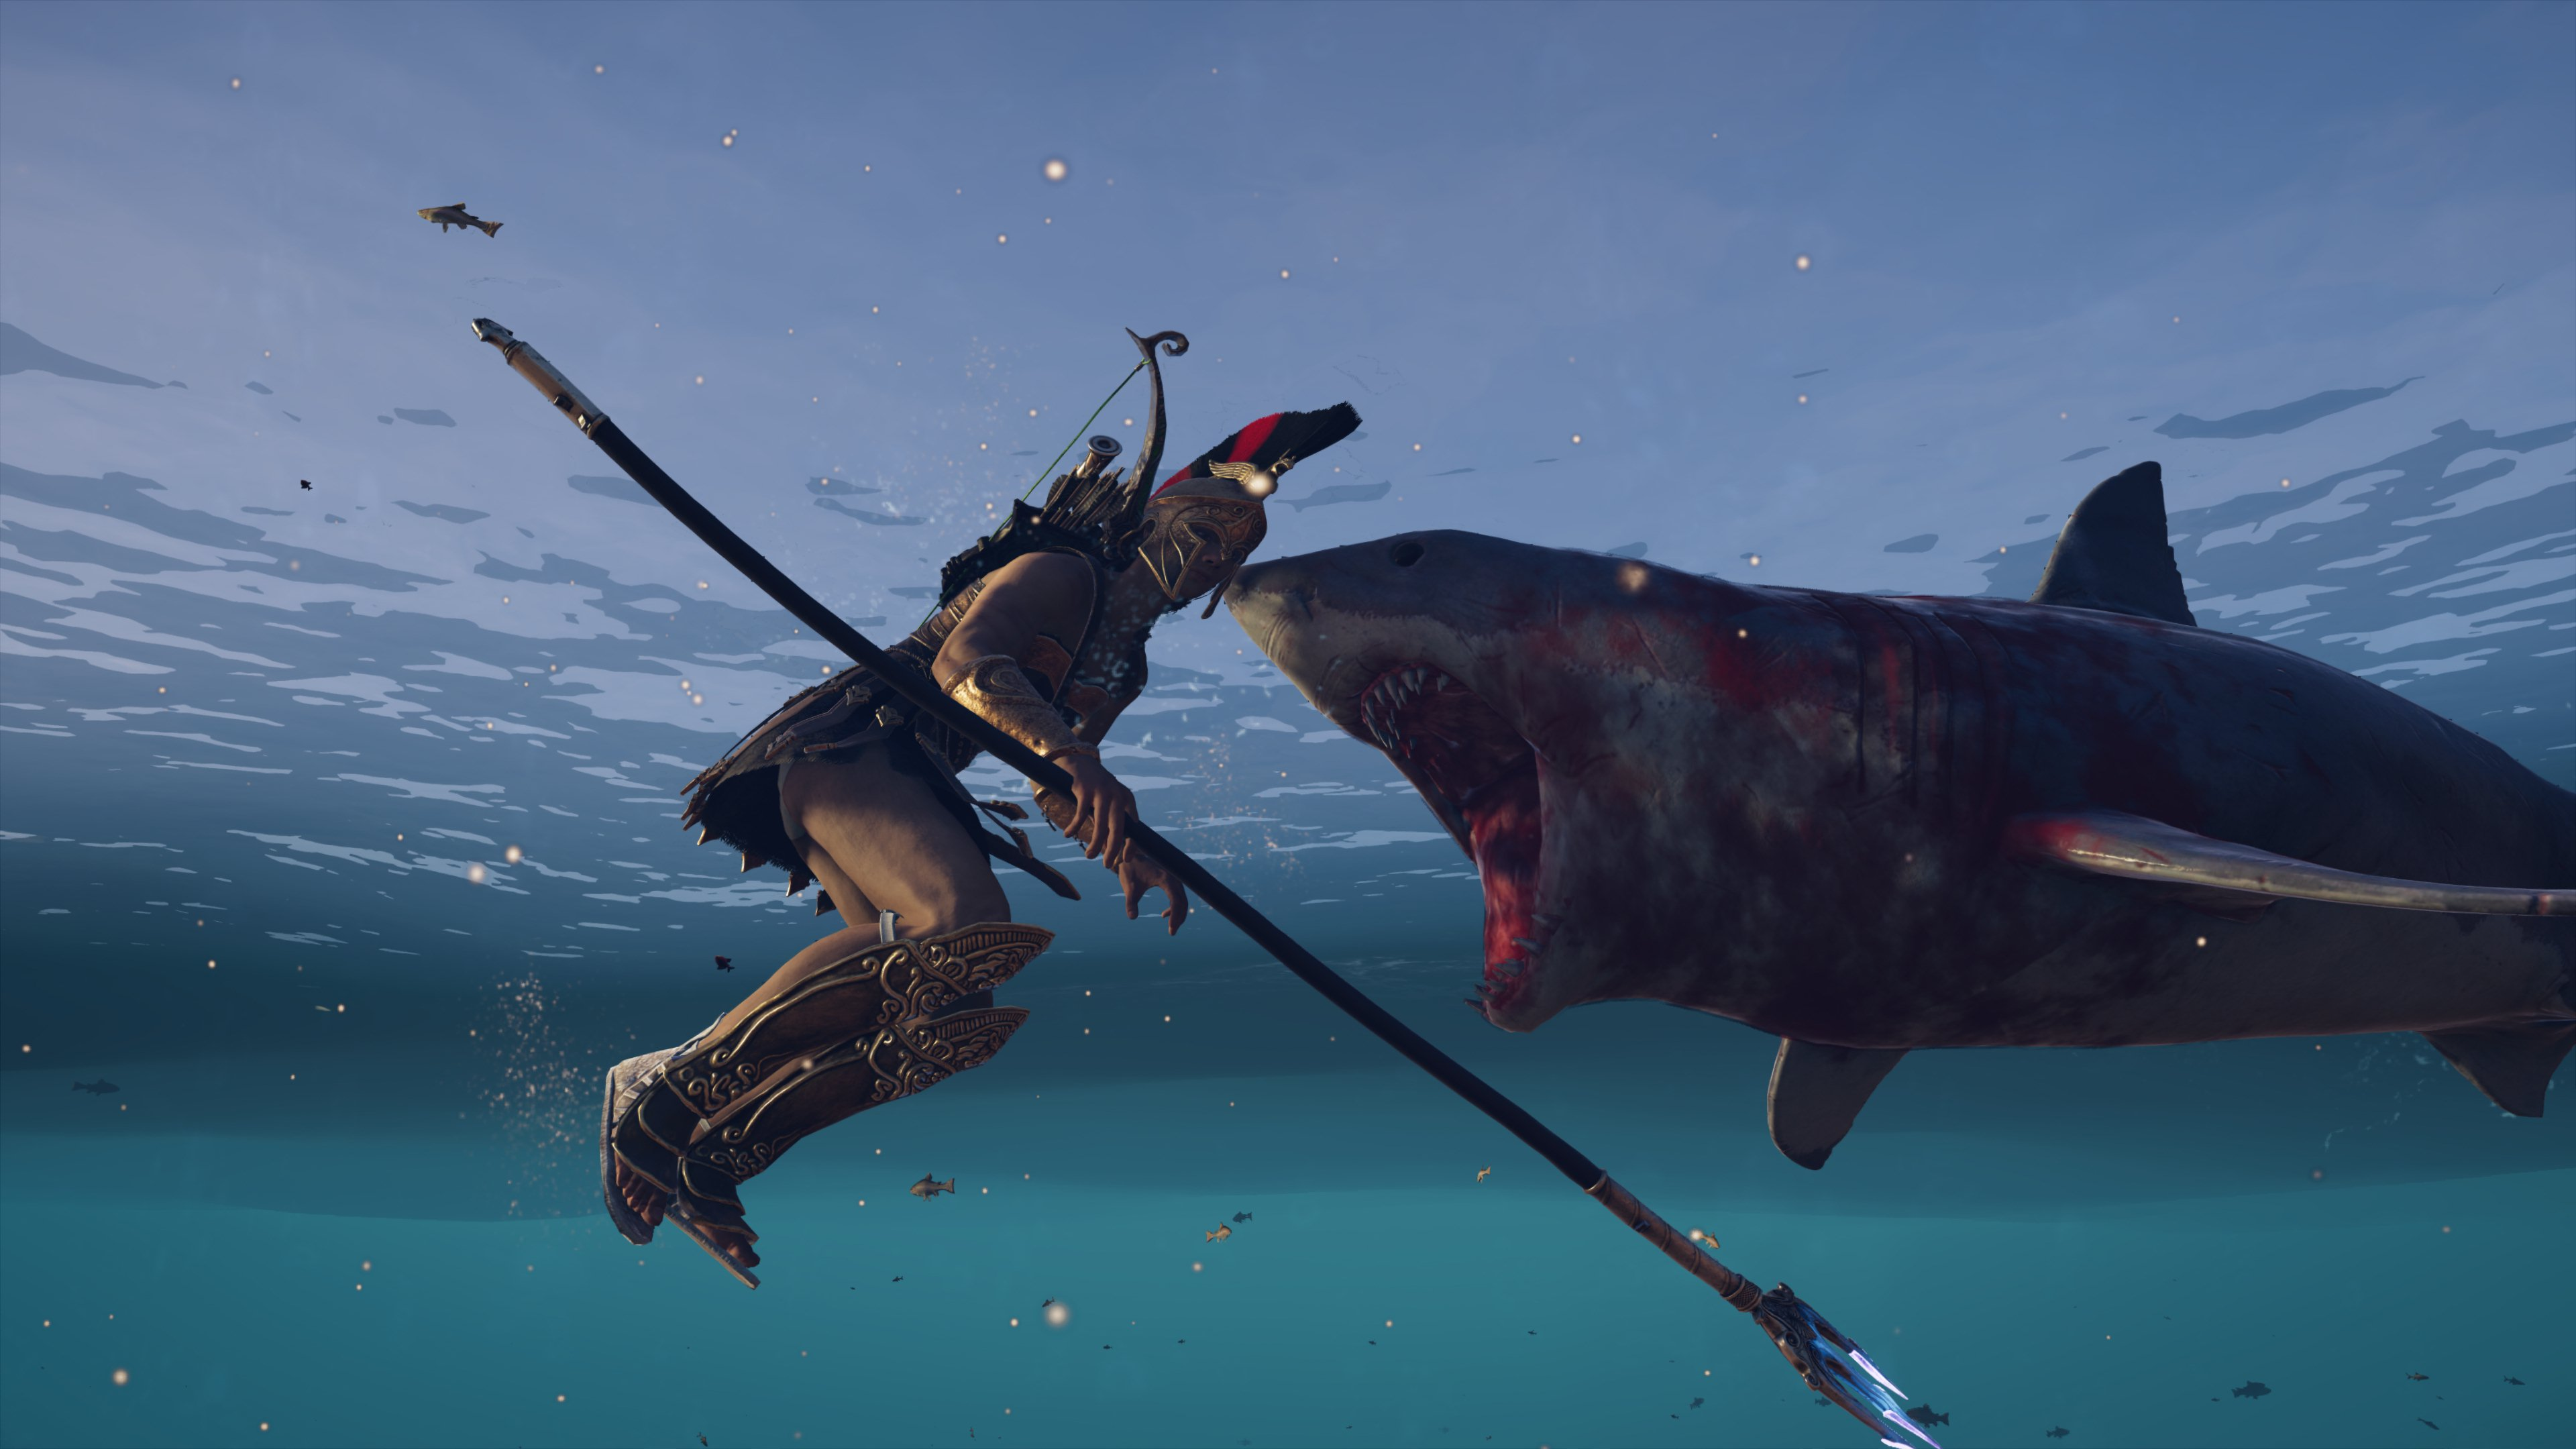 2018118150937.jpg - Assassin's Creed: Odyssey